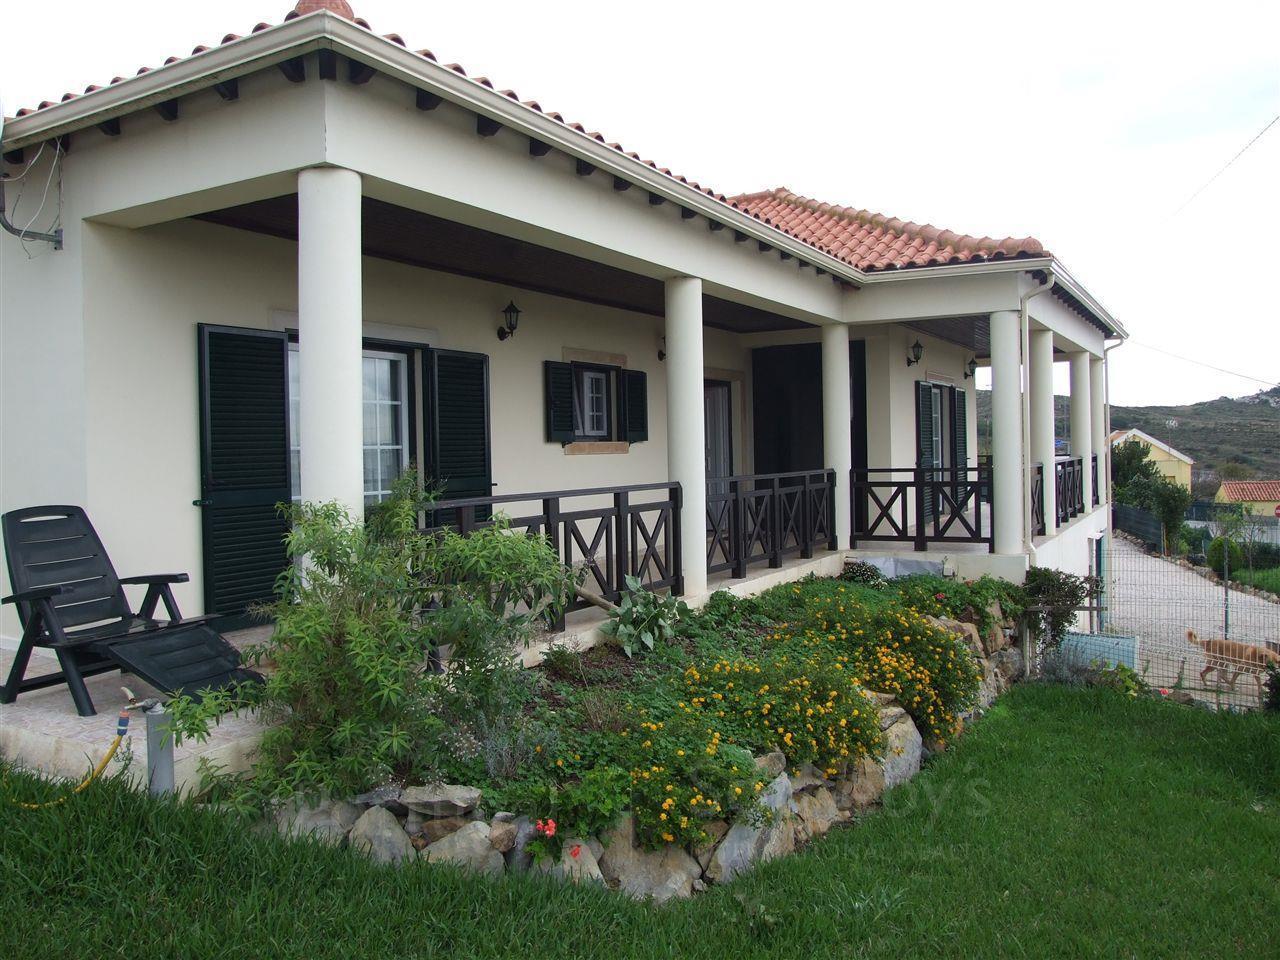 Moradia para Venda às Detached house, 3 bedrooms, for Sale Sintra, Lisboa Portugal